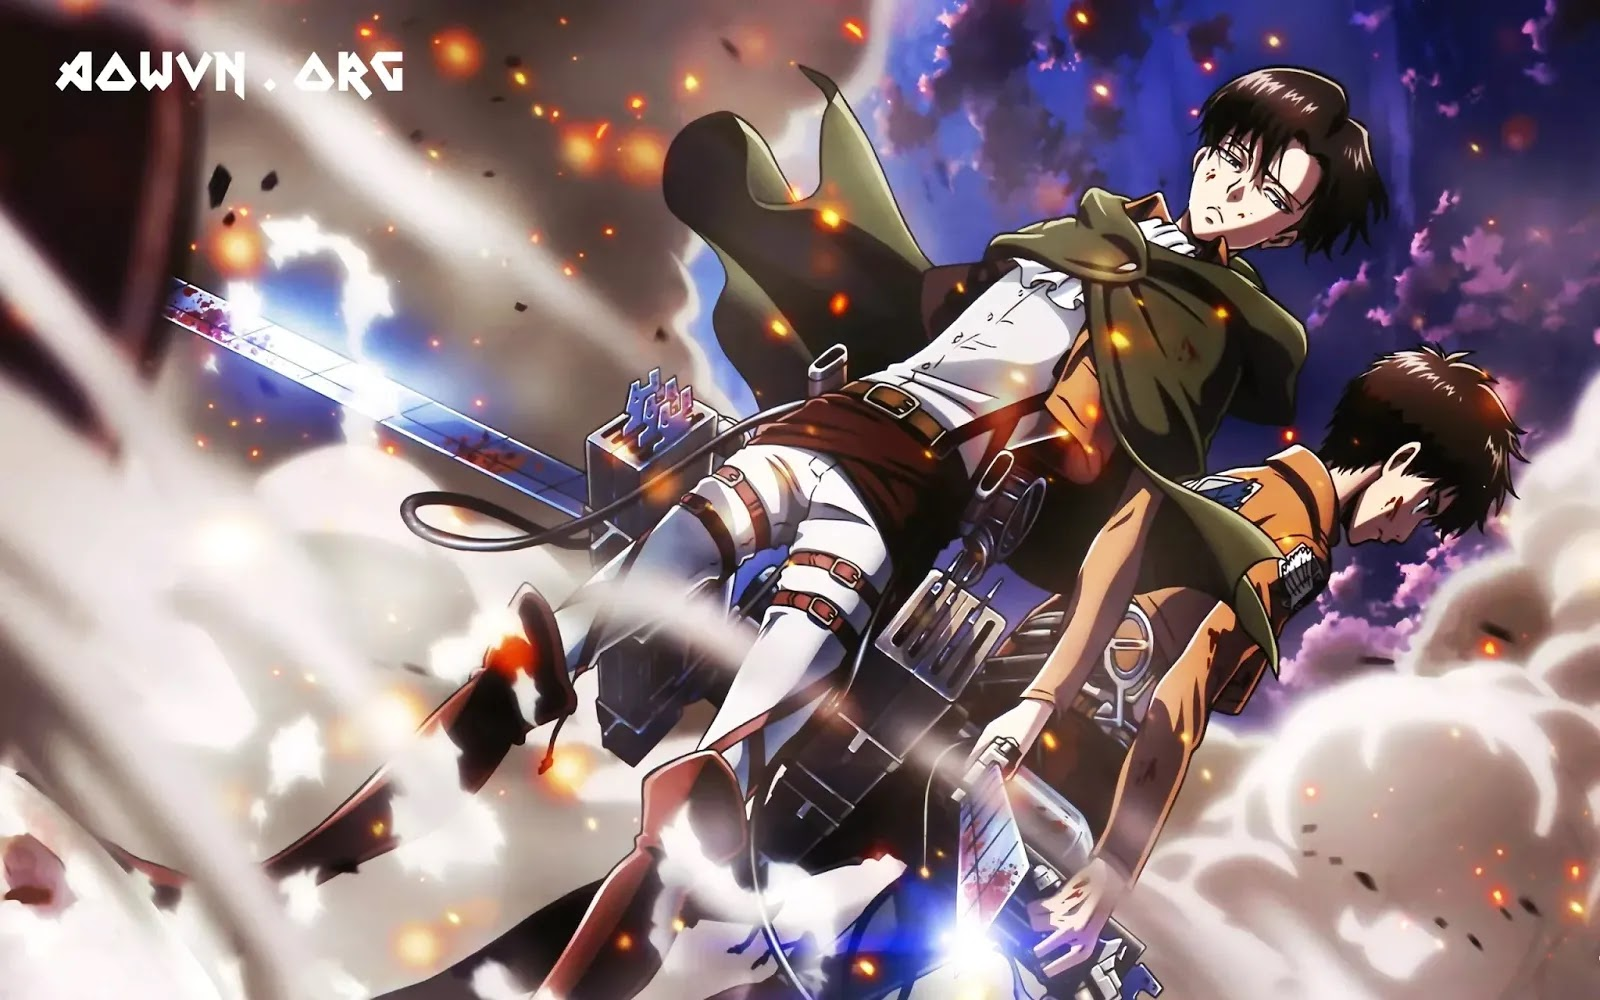 AowVN.org minz%2B%25282%2529 - [ Anime 3gp Mp4 ] Attack On Titan TV & Bluray SS1 + SS2 | Vietsub - Shingeki No Kyojin